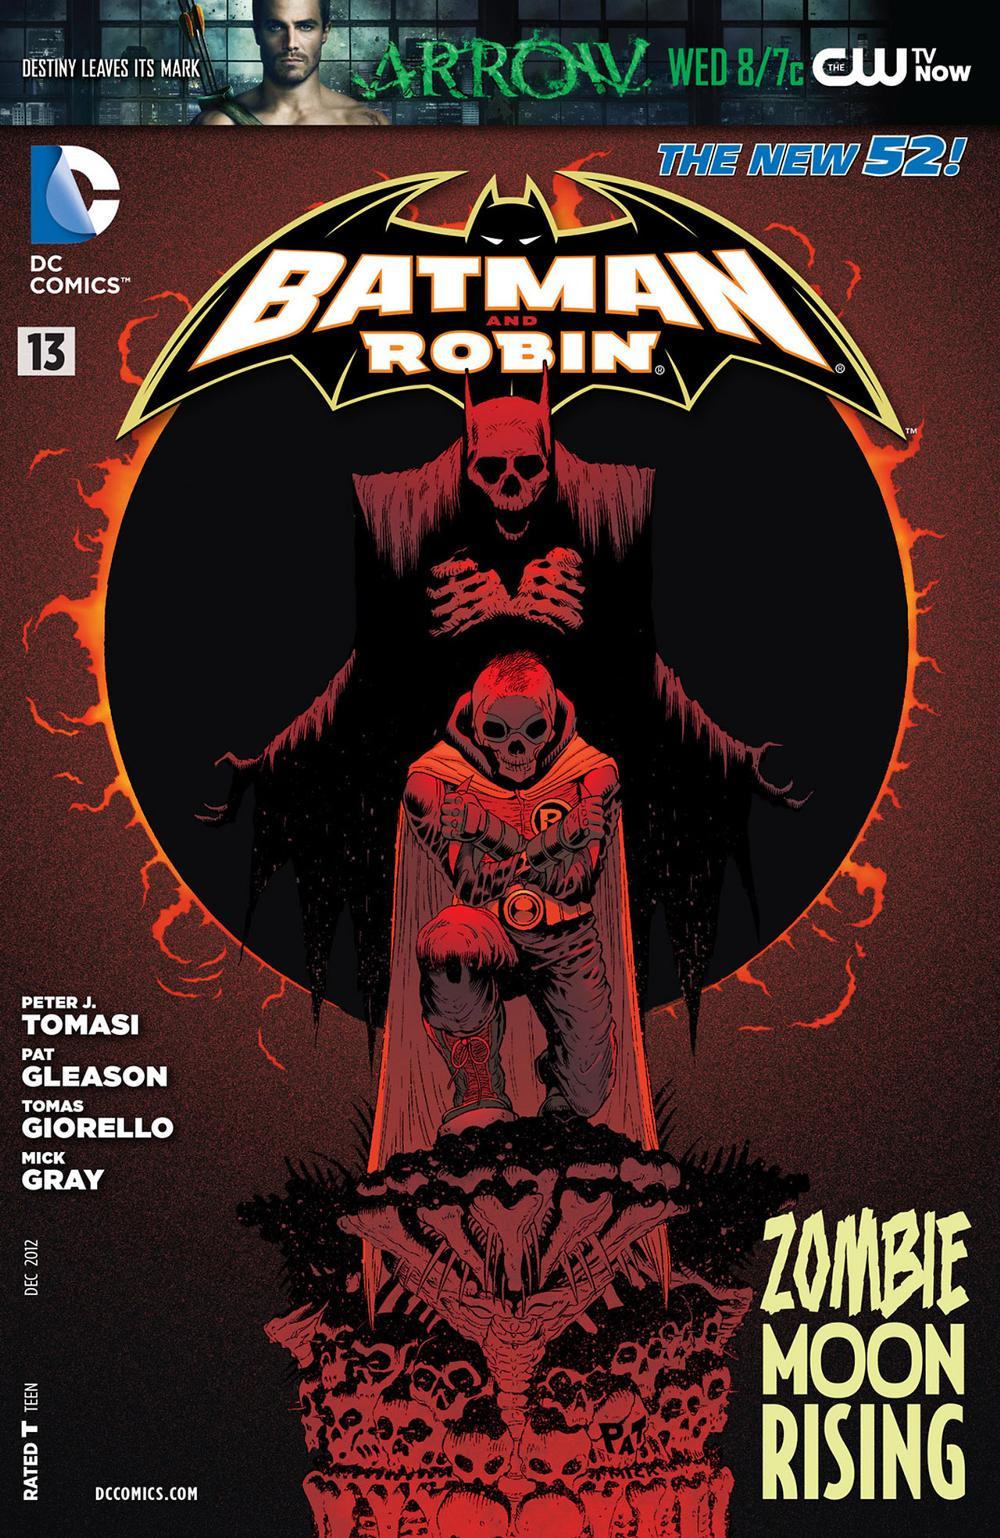 Batman & Robin 13 - Batman and Robin - Zombie Moonrising